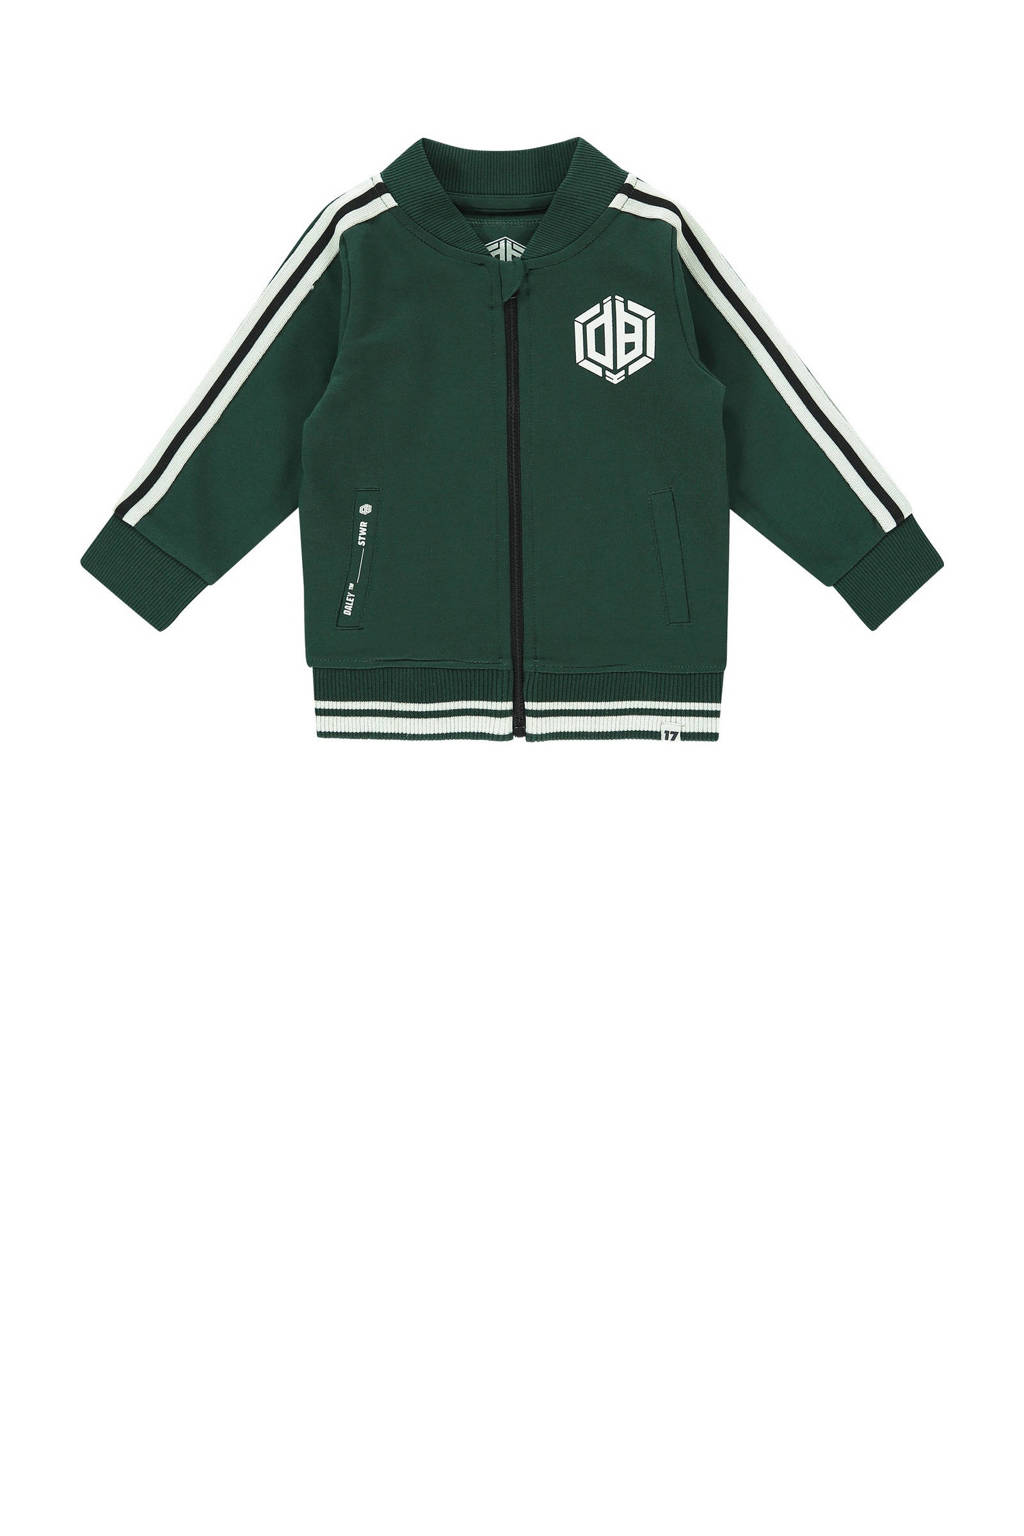 Vingino Daley Blind vest Onano mini met contrastbies groen/wit, Groen/wit